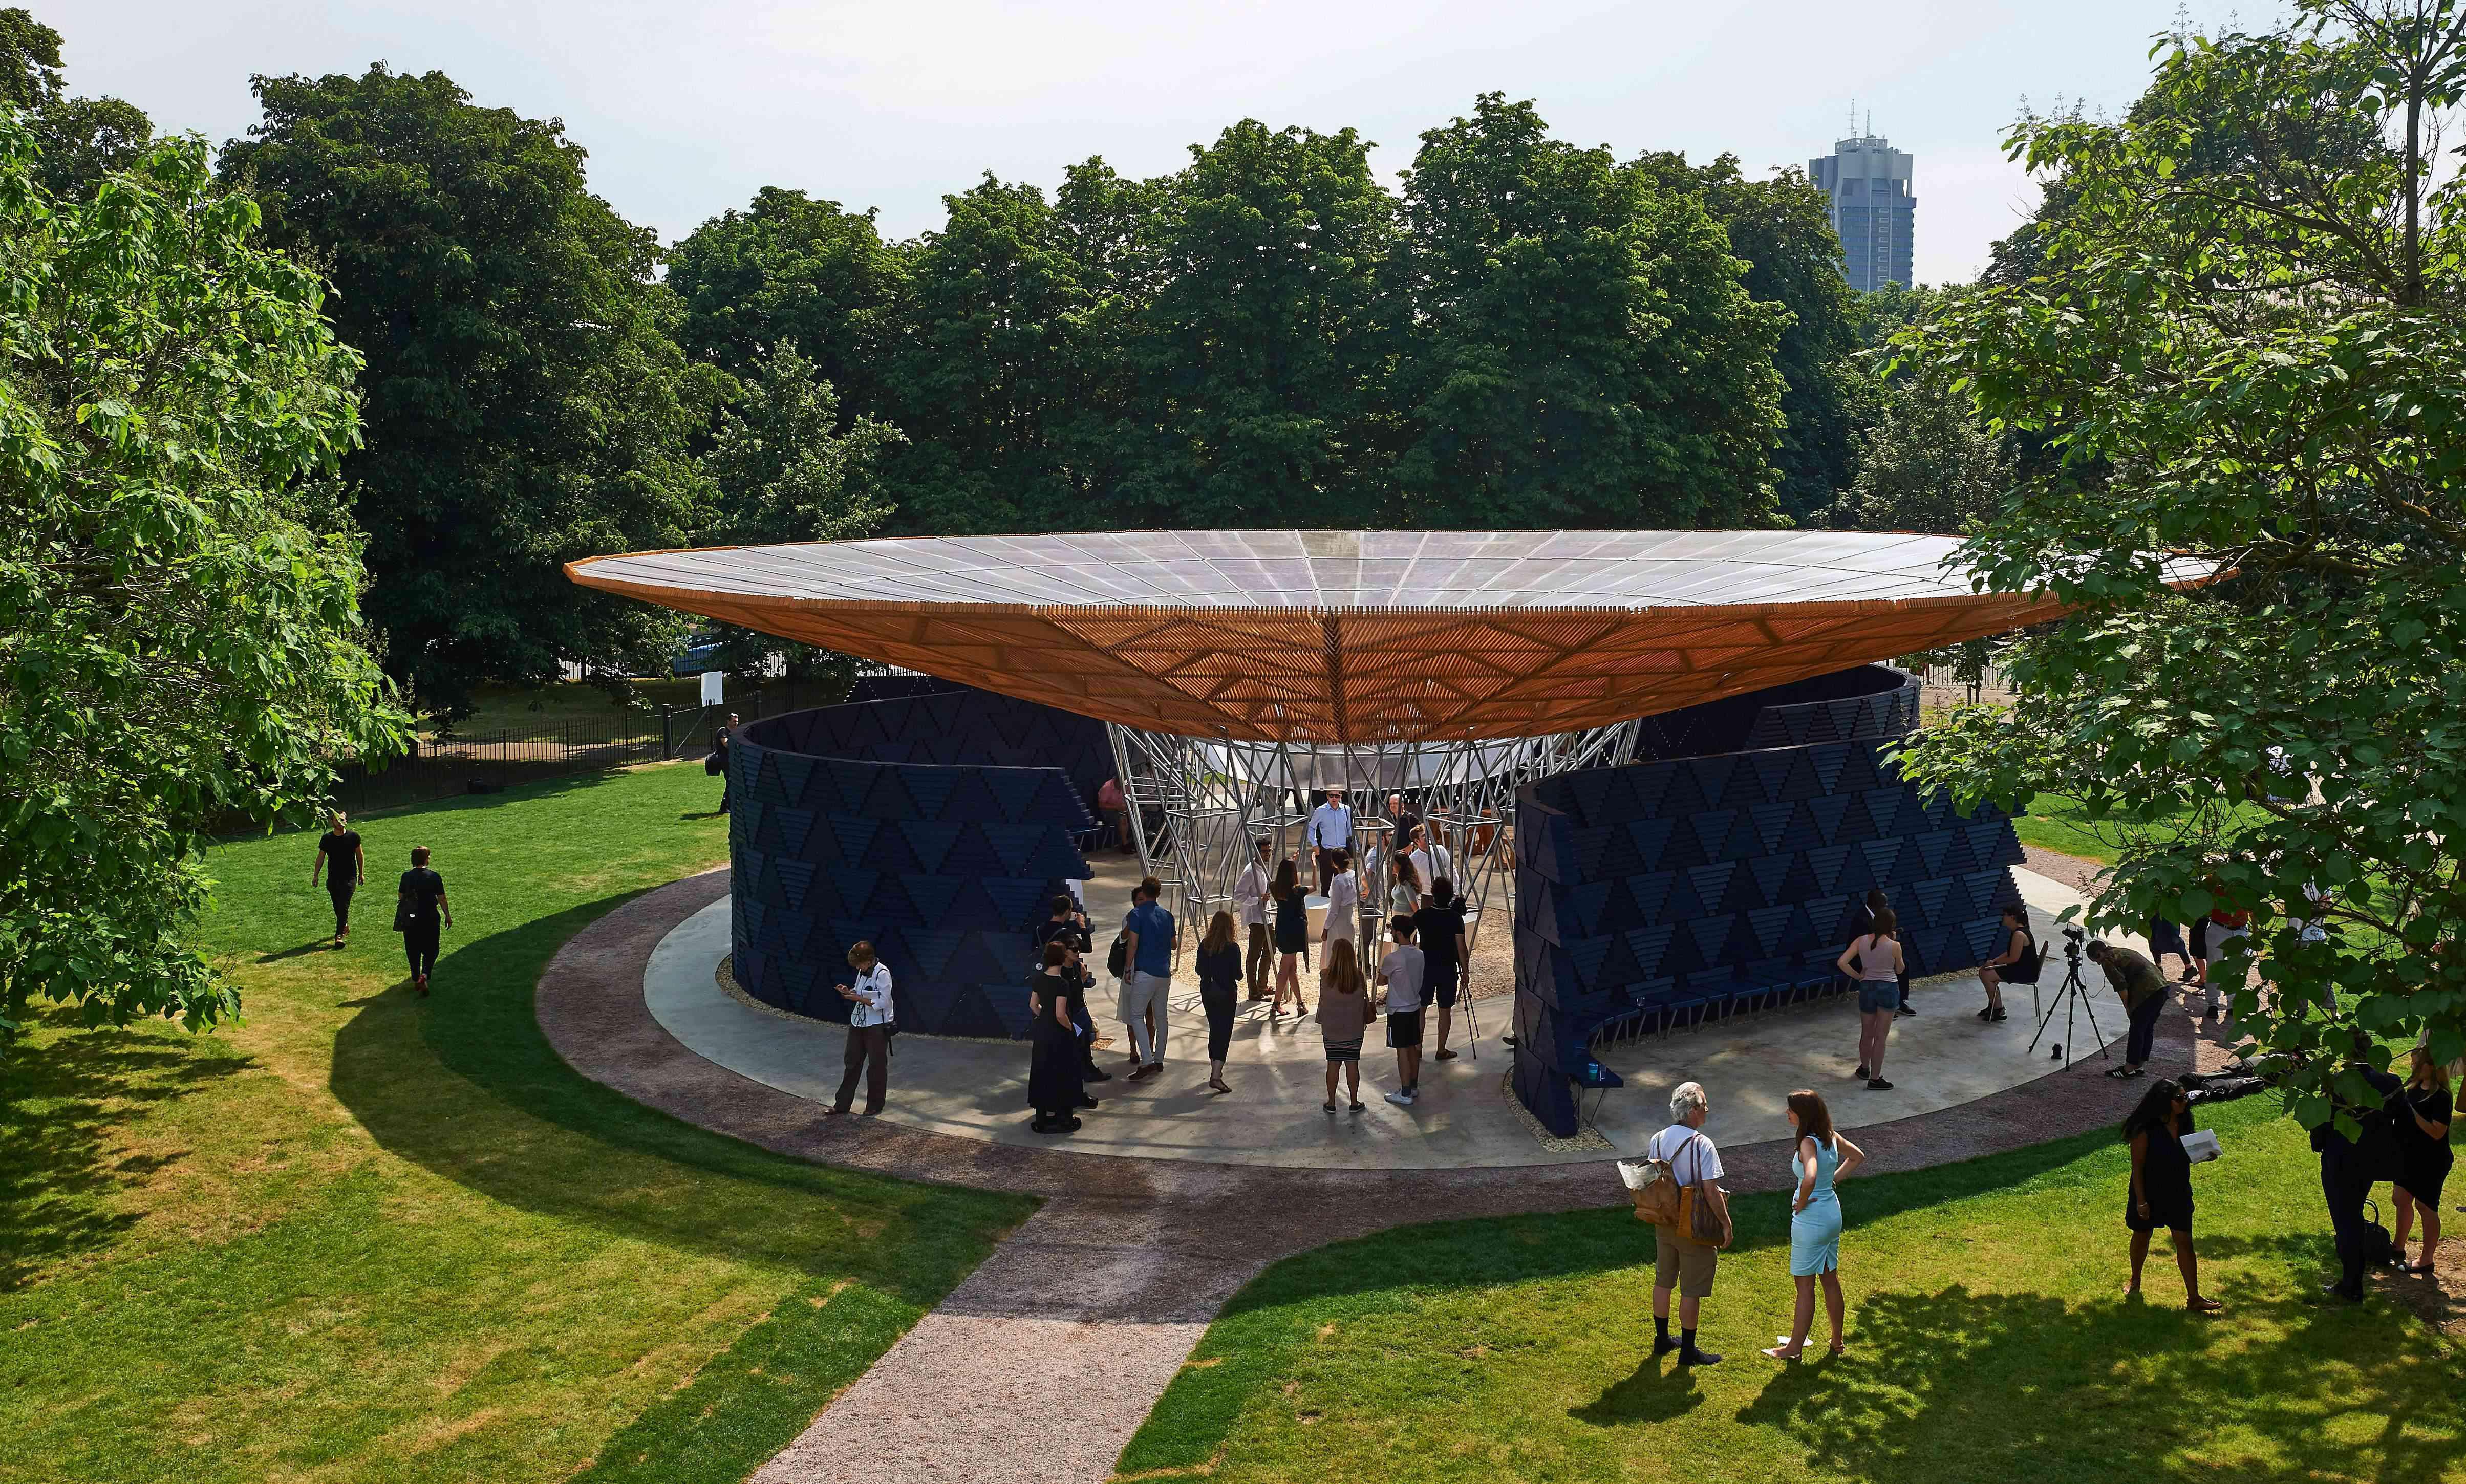 Serpentine Gallery Pavilion, by Burkinabe architect Diebedo Francis Kere